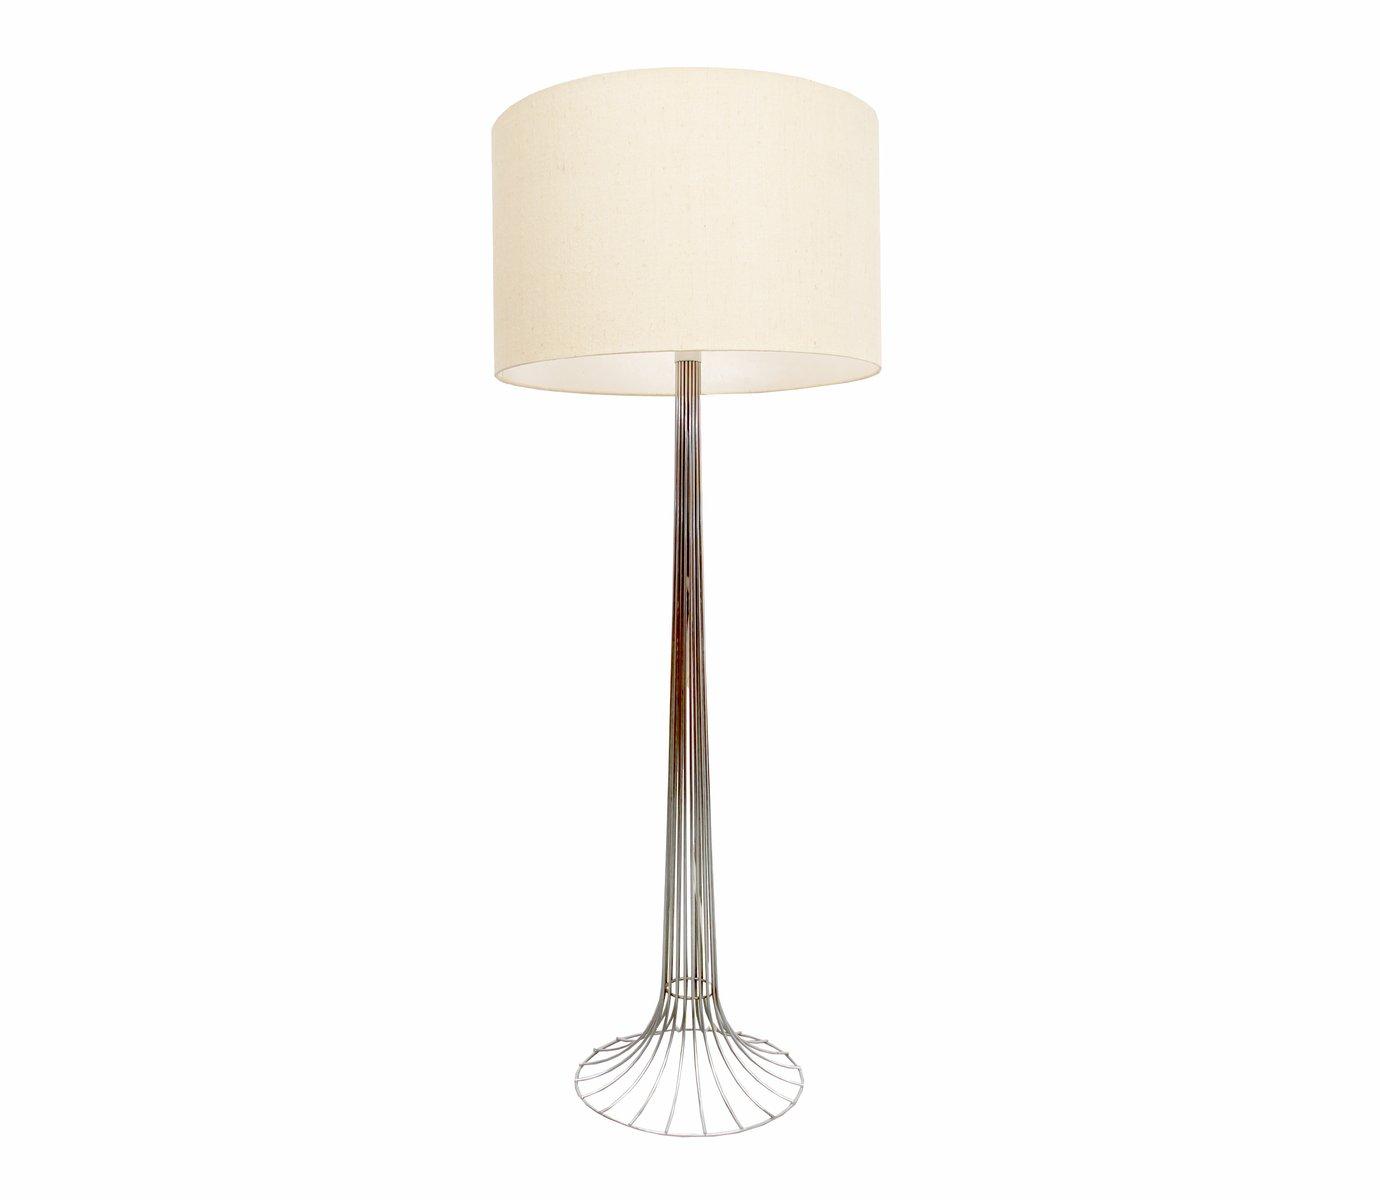 Vintage Wire Floor Lamp By Verner Panton For Fritz Hansen Sale Wiring A